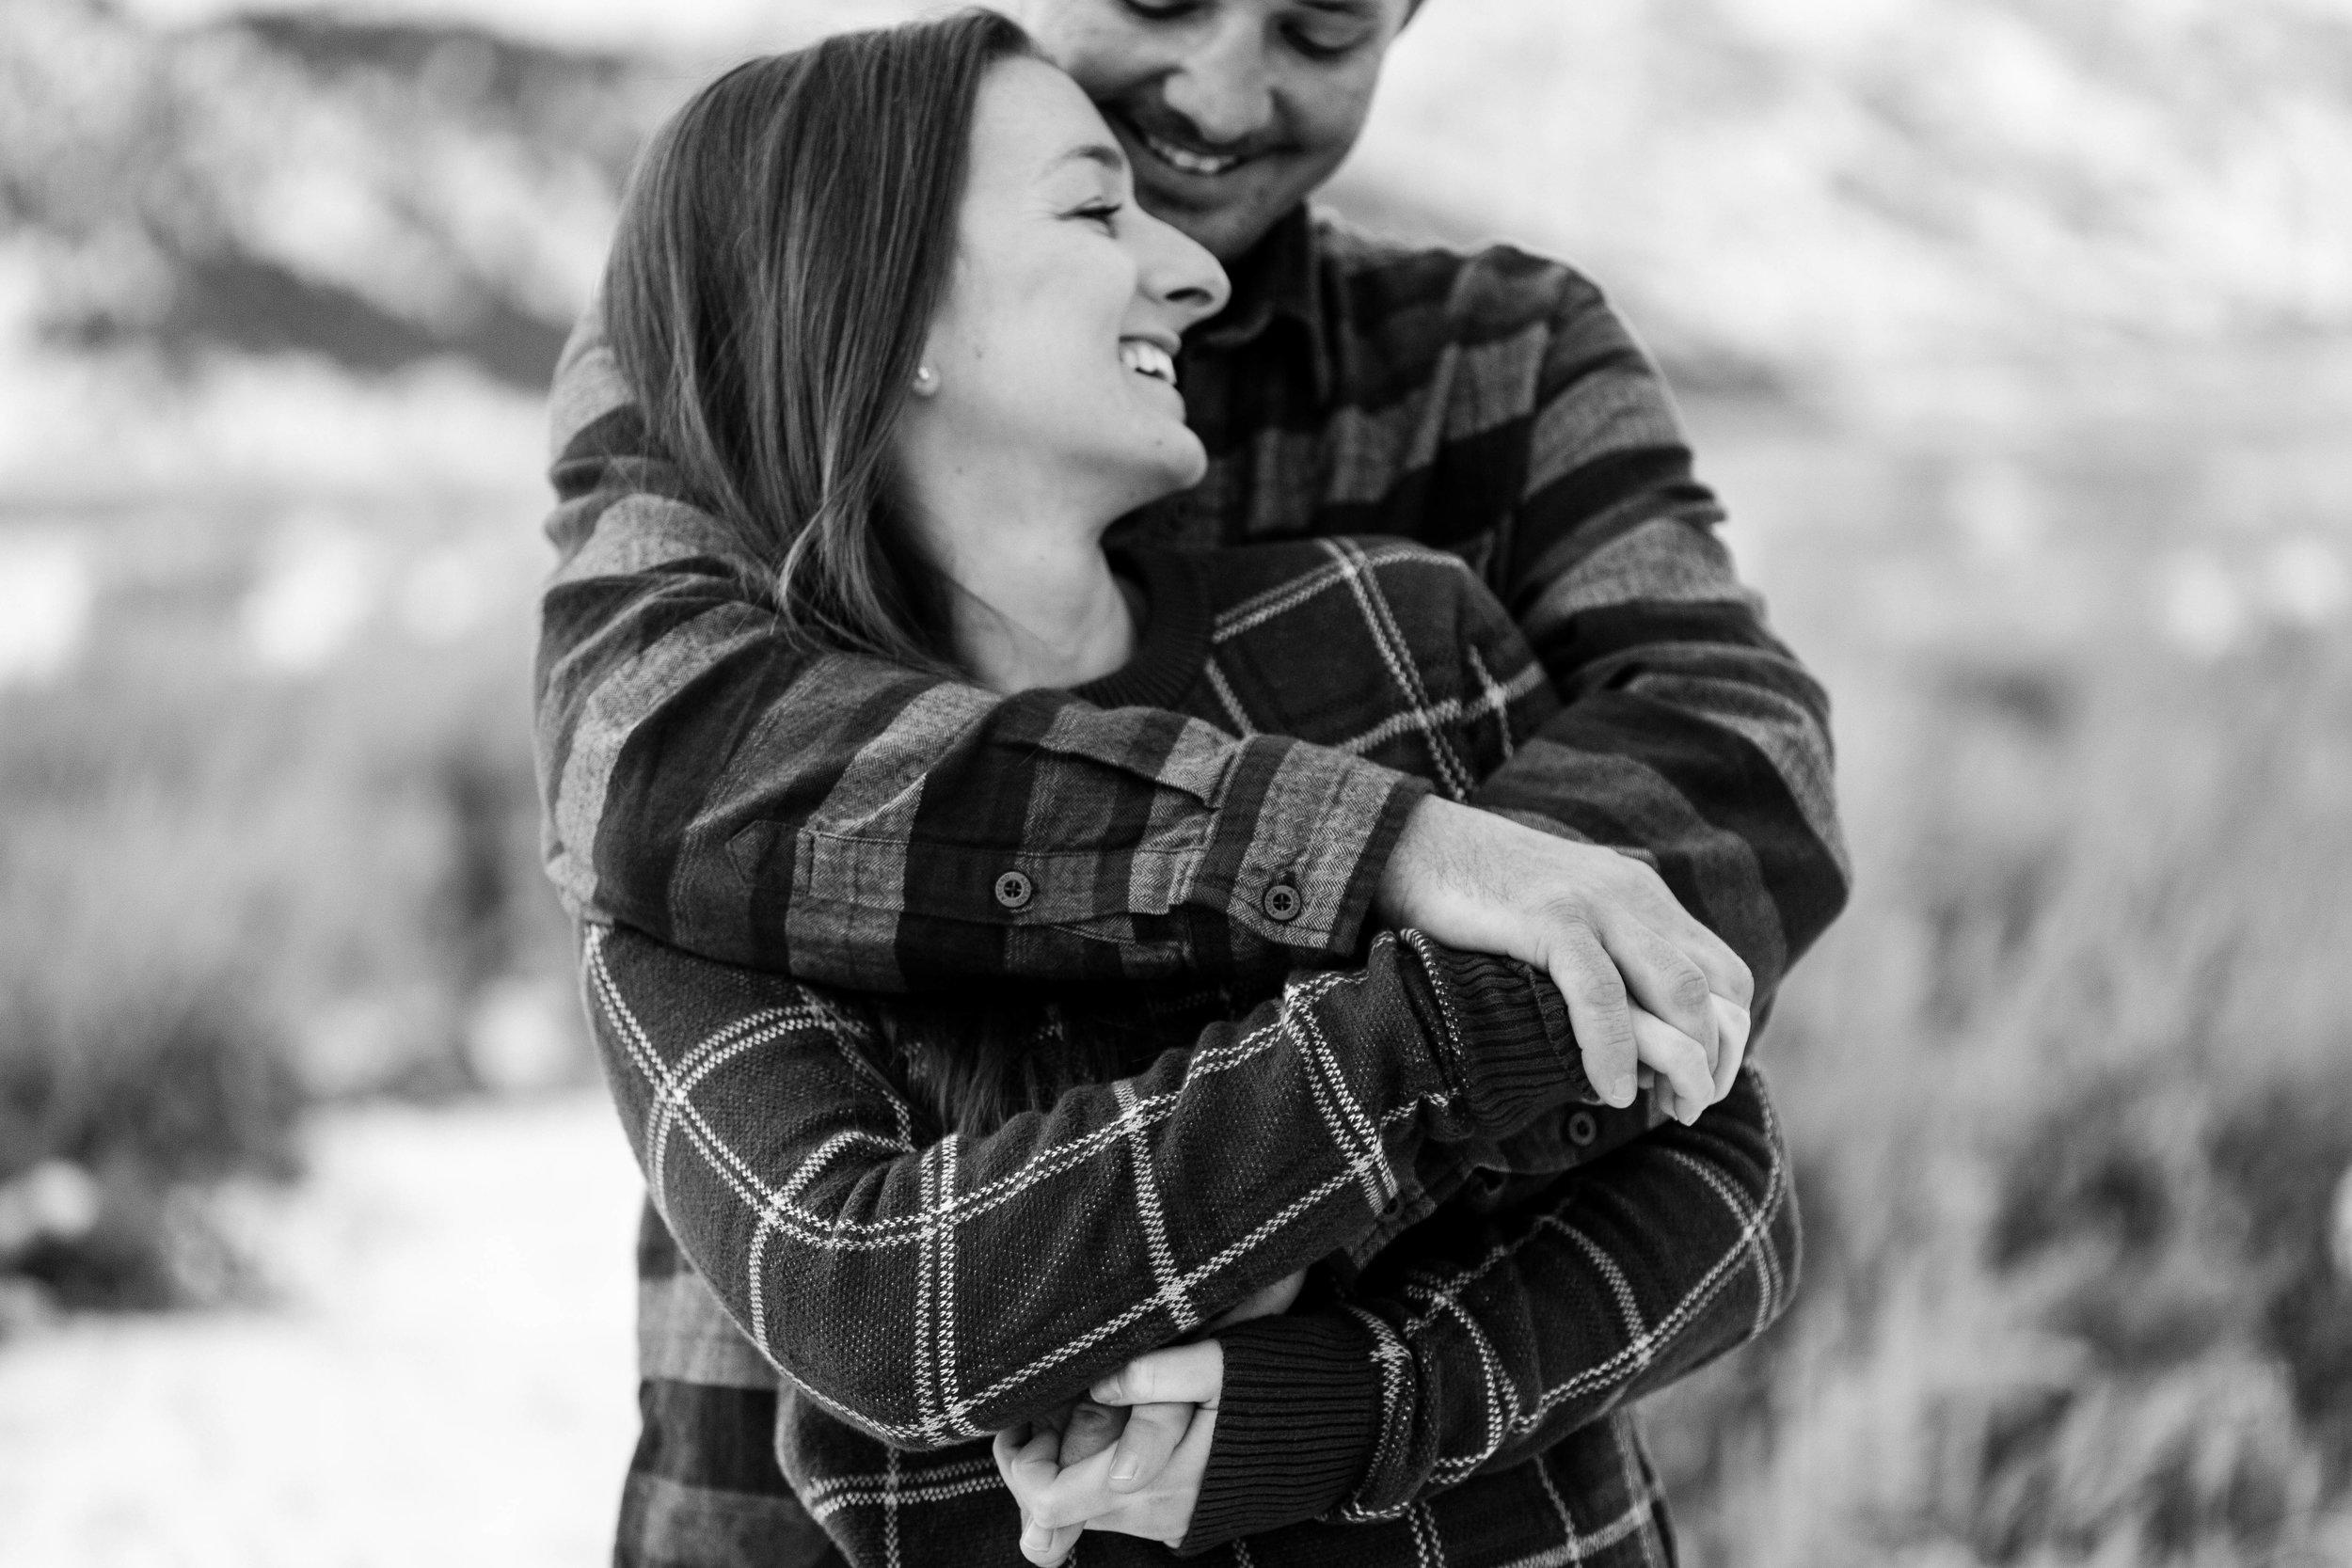 nicole-daacke-photography-grand-teton-elopement-grand-teton-wedding-national-park-wedding-adventure-wedding-adventurous-engagement-session-snowy-winter-inspiration-photographer-24.jpg